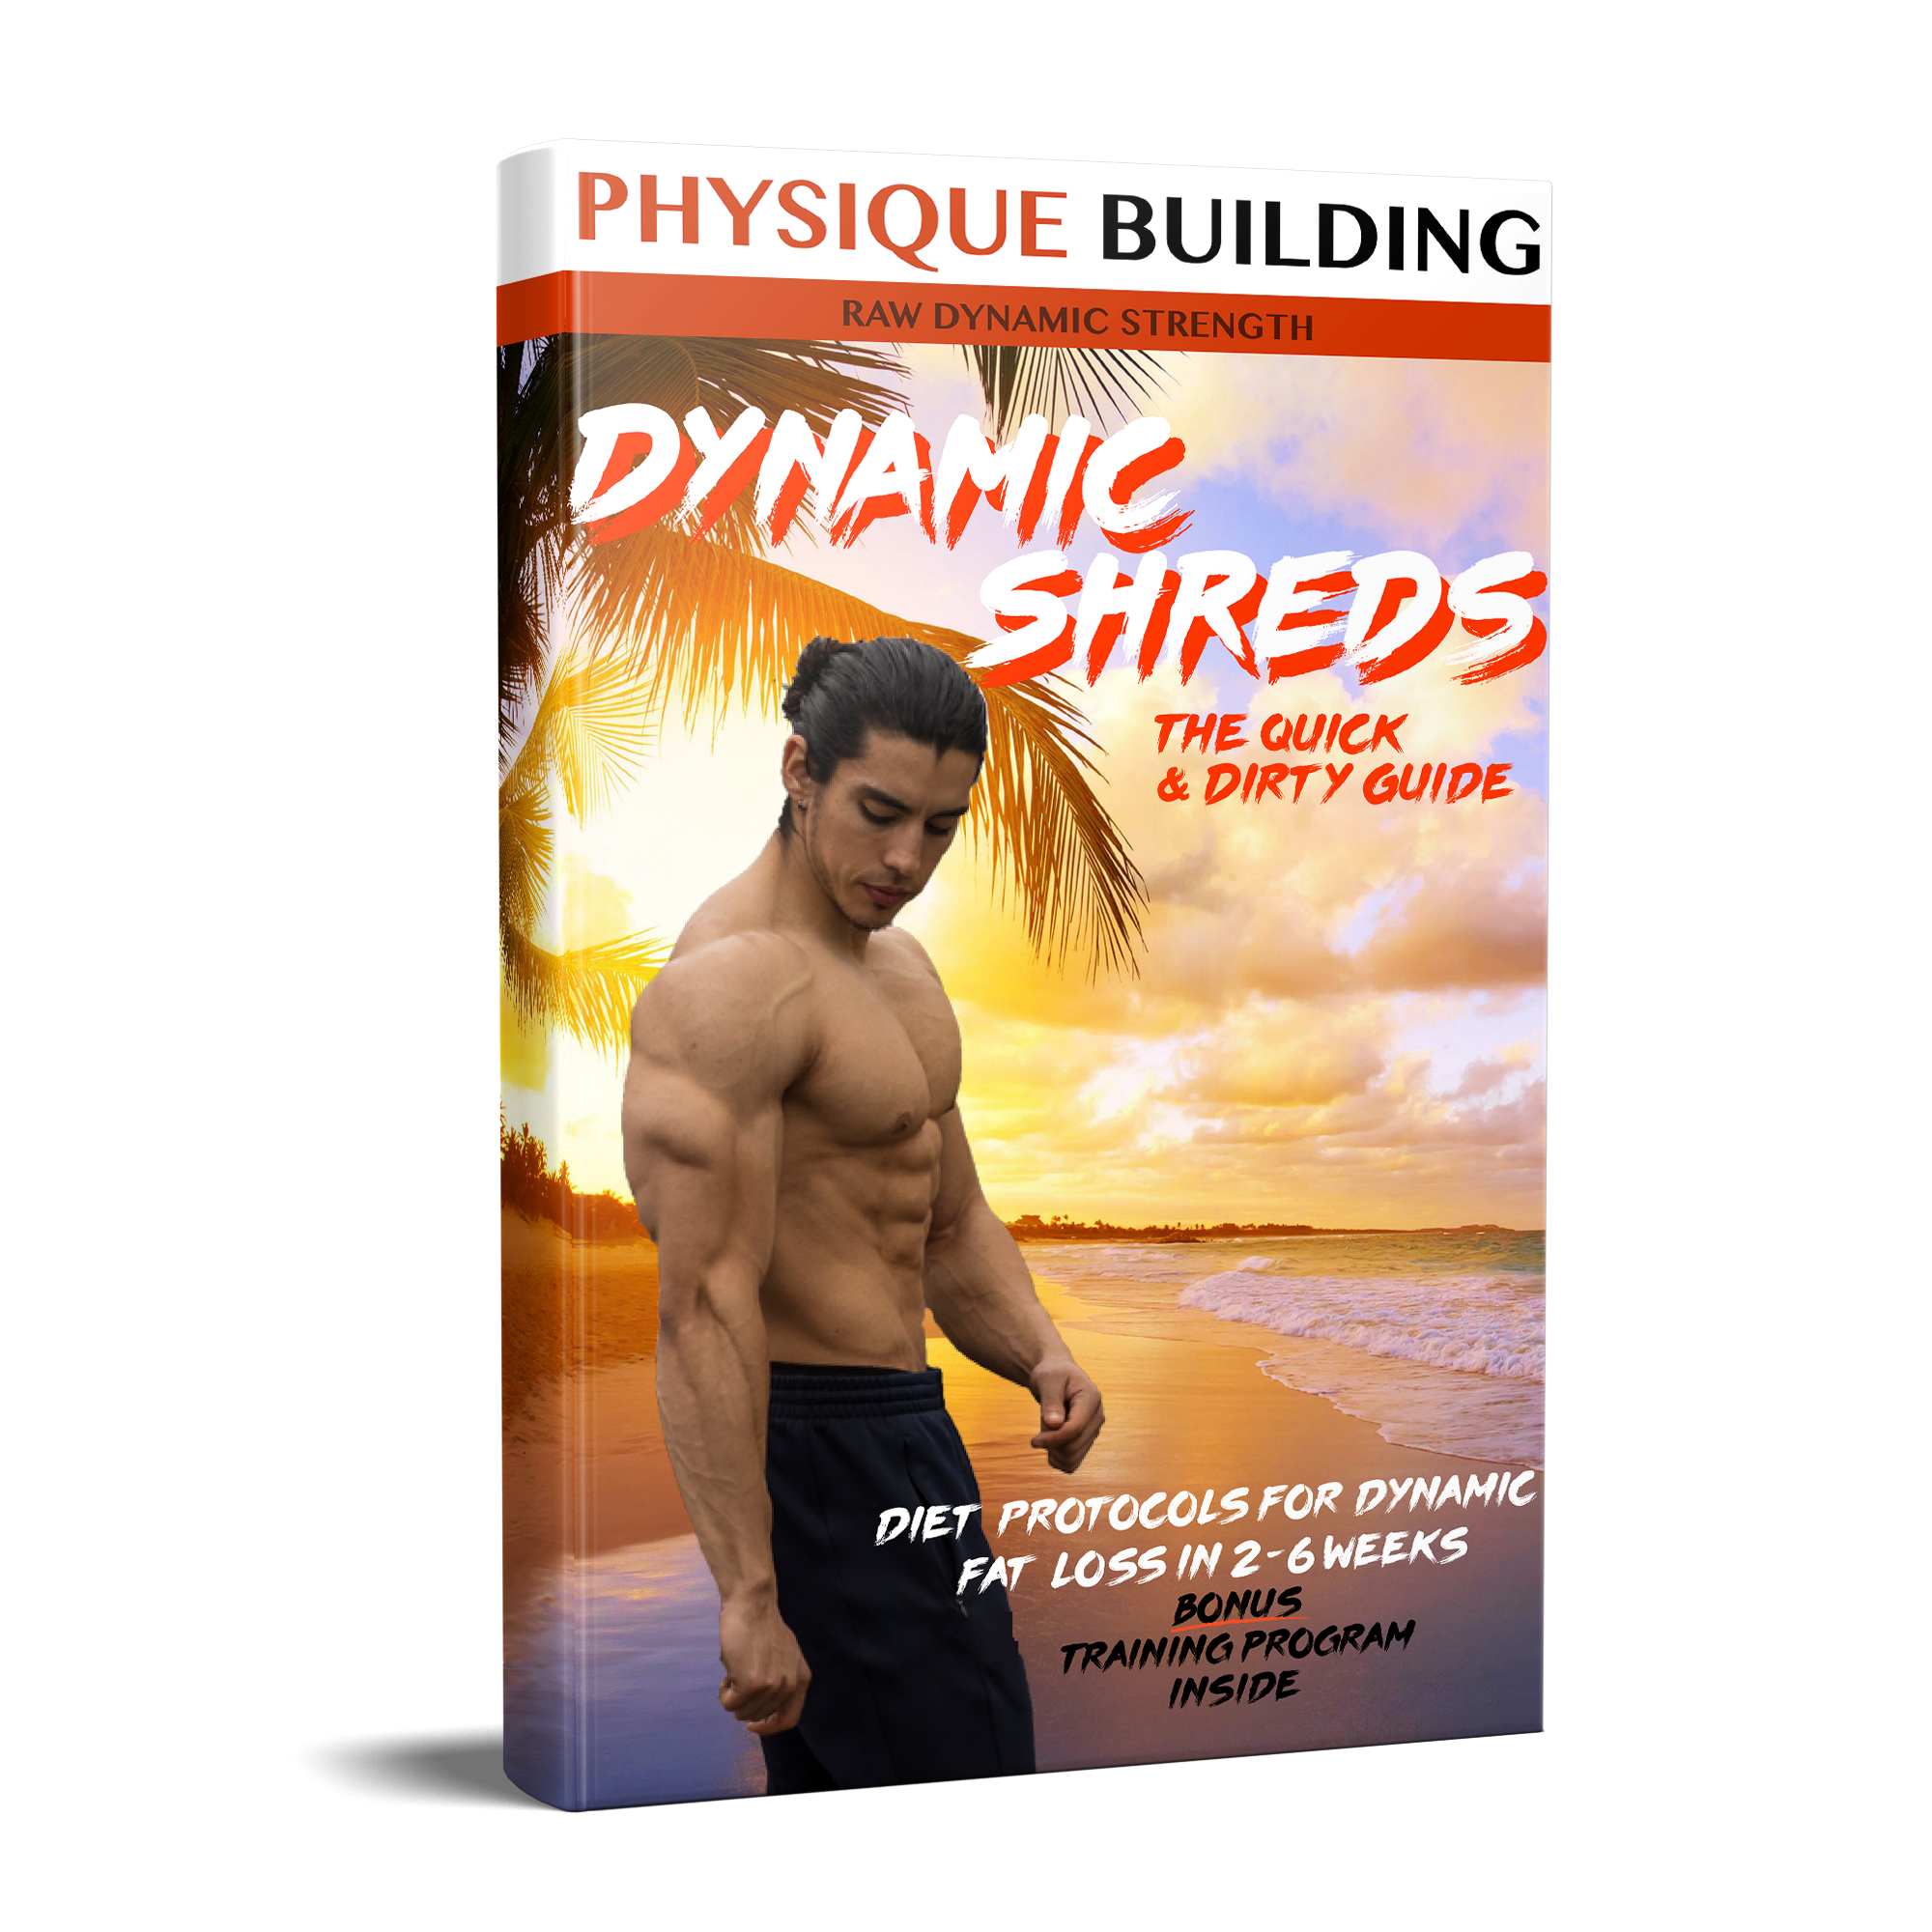 DynamicShreds1.png